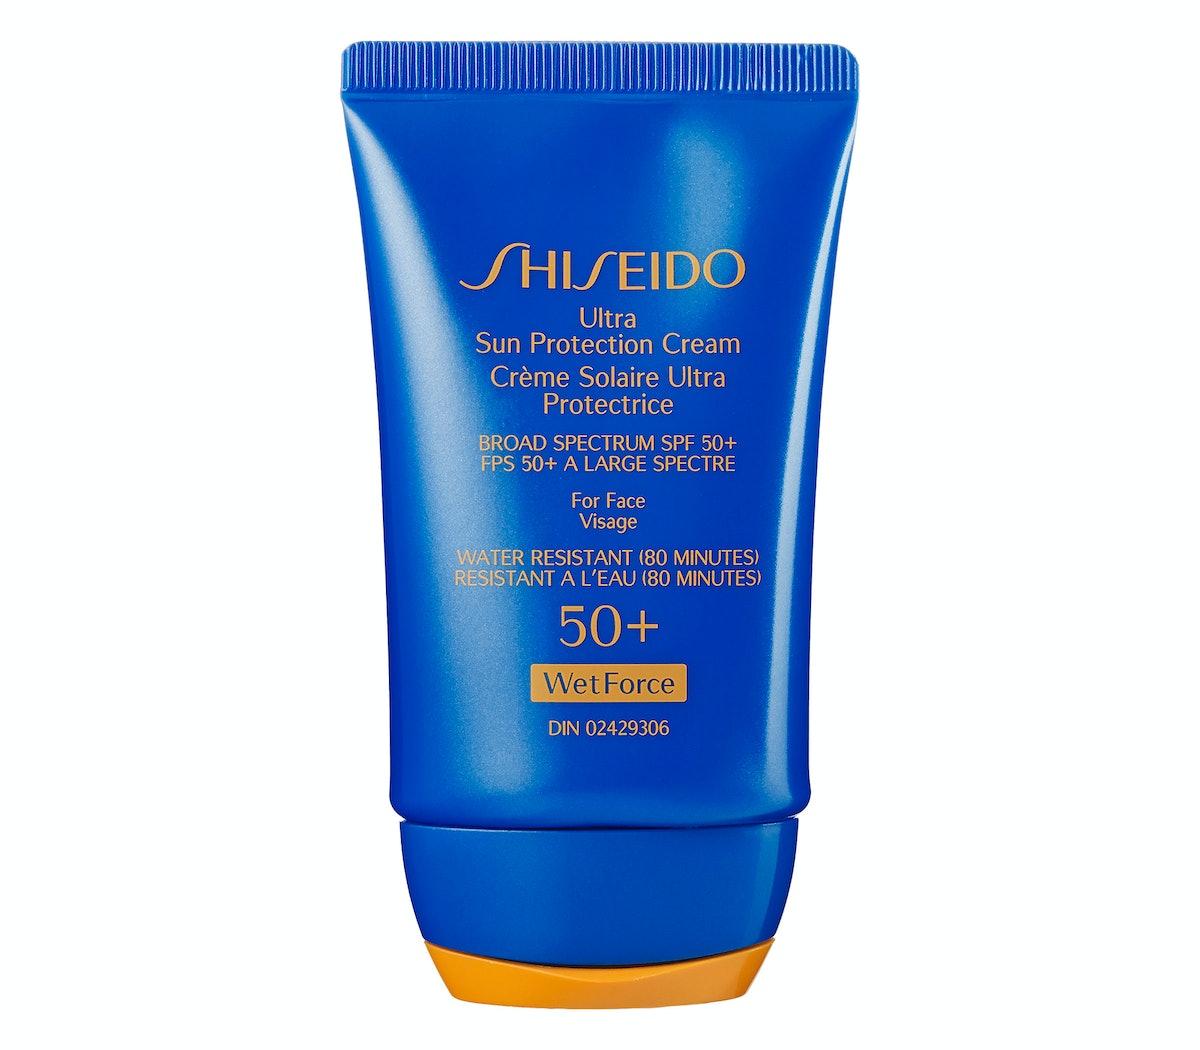 Shiseido Wetforce Ultimate Sun Protection Cream Broad Spectrum SPF 50+ for Face